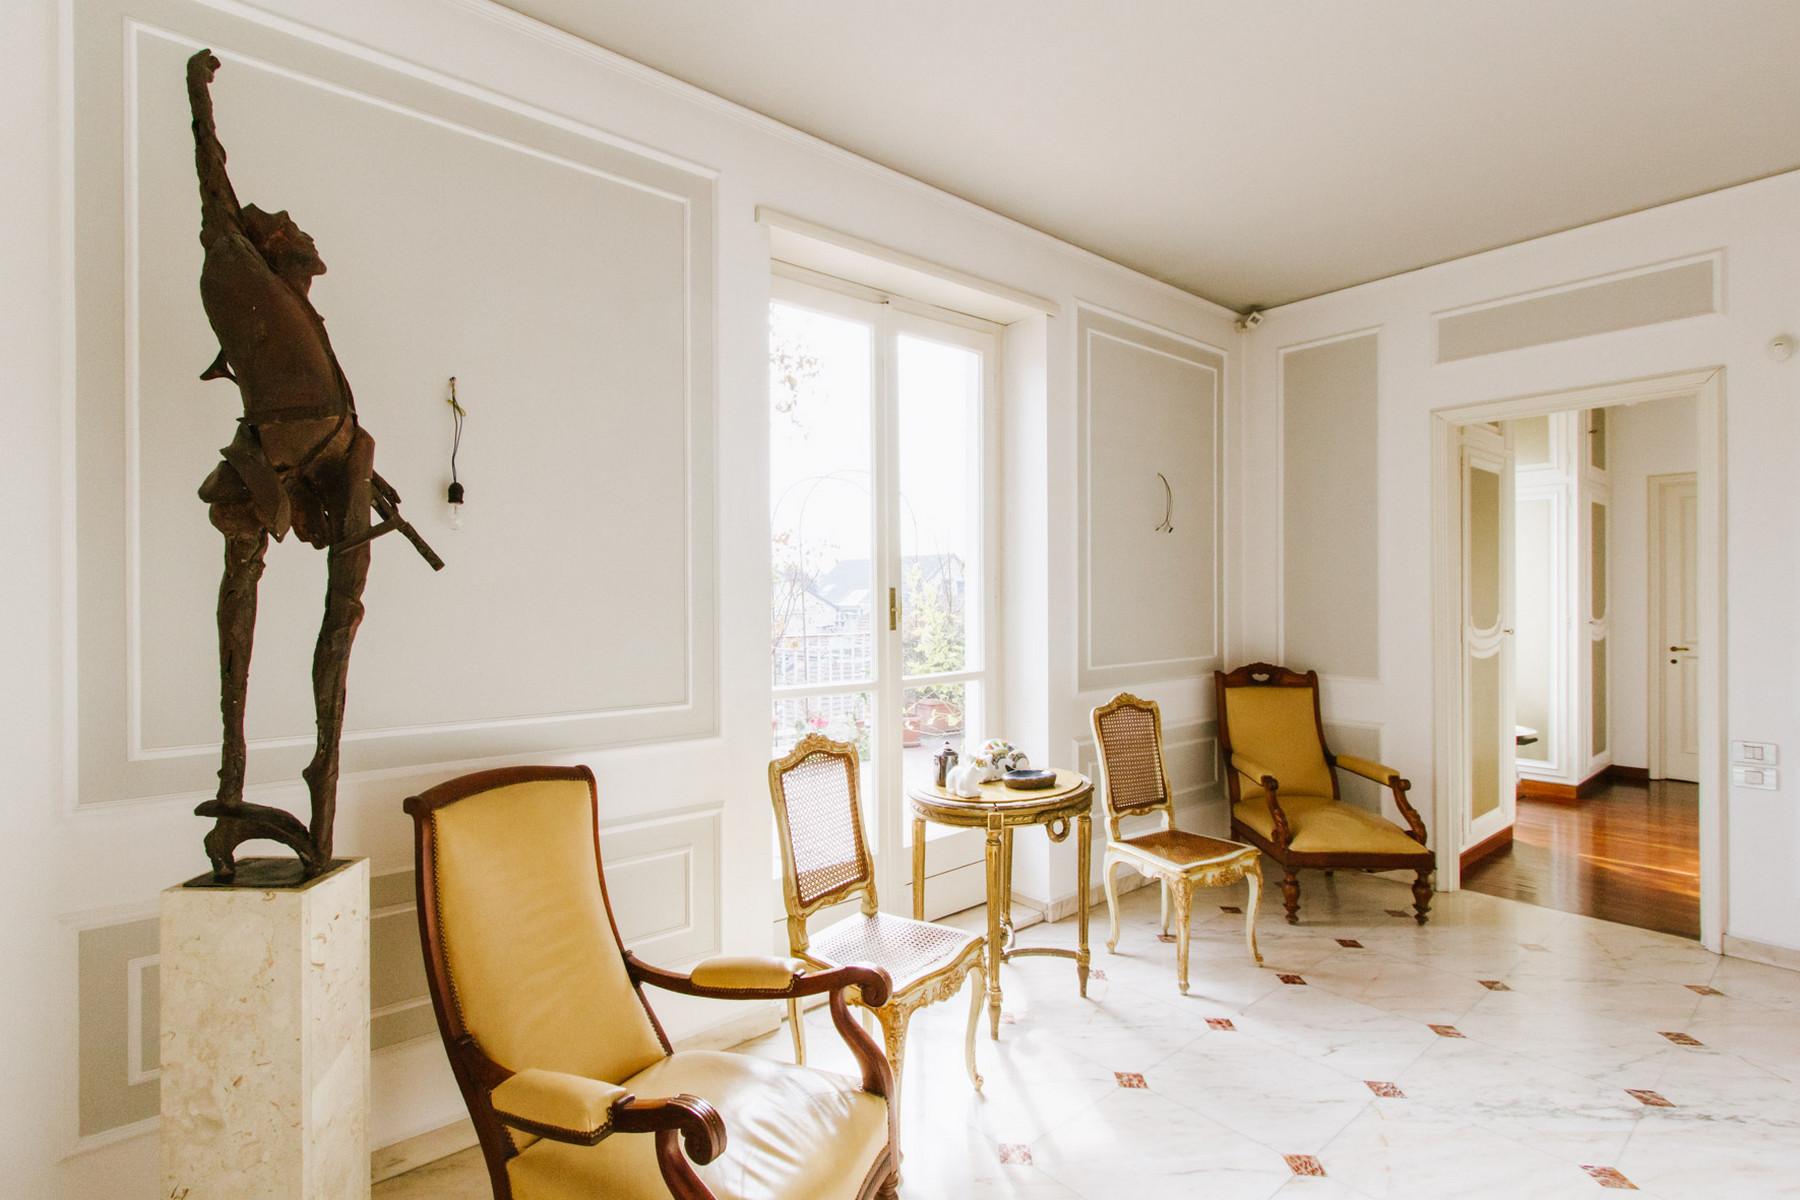 Additional photo for property listing at Exquisite apartment in prestigious building Via Lamarmora Torino, Turin 10121 Italia